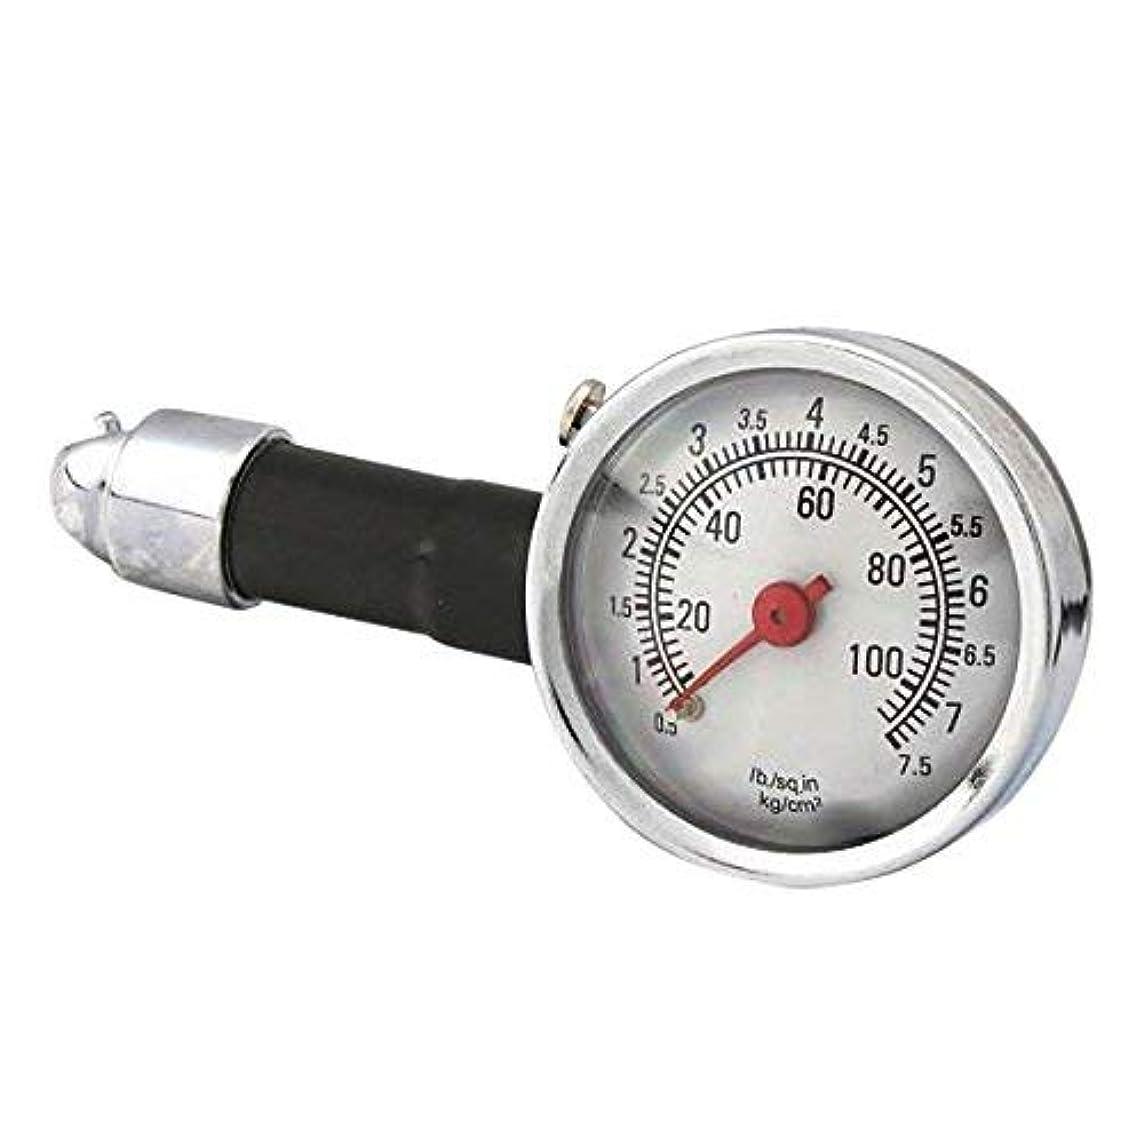 Other Tools - Car Dial Tire Gauge Meter Precision Pressure Tyre Measure Metal - Metal Tire Pressure Gauge Guage